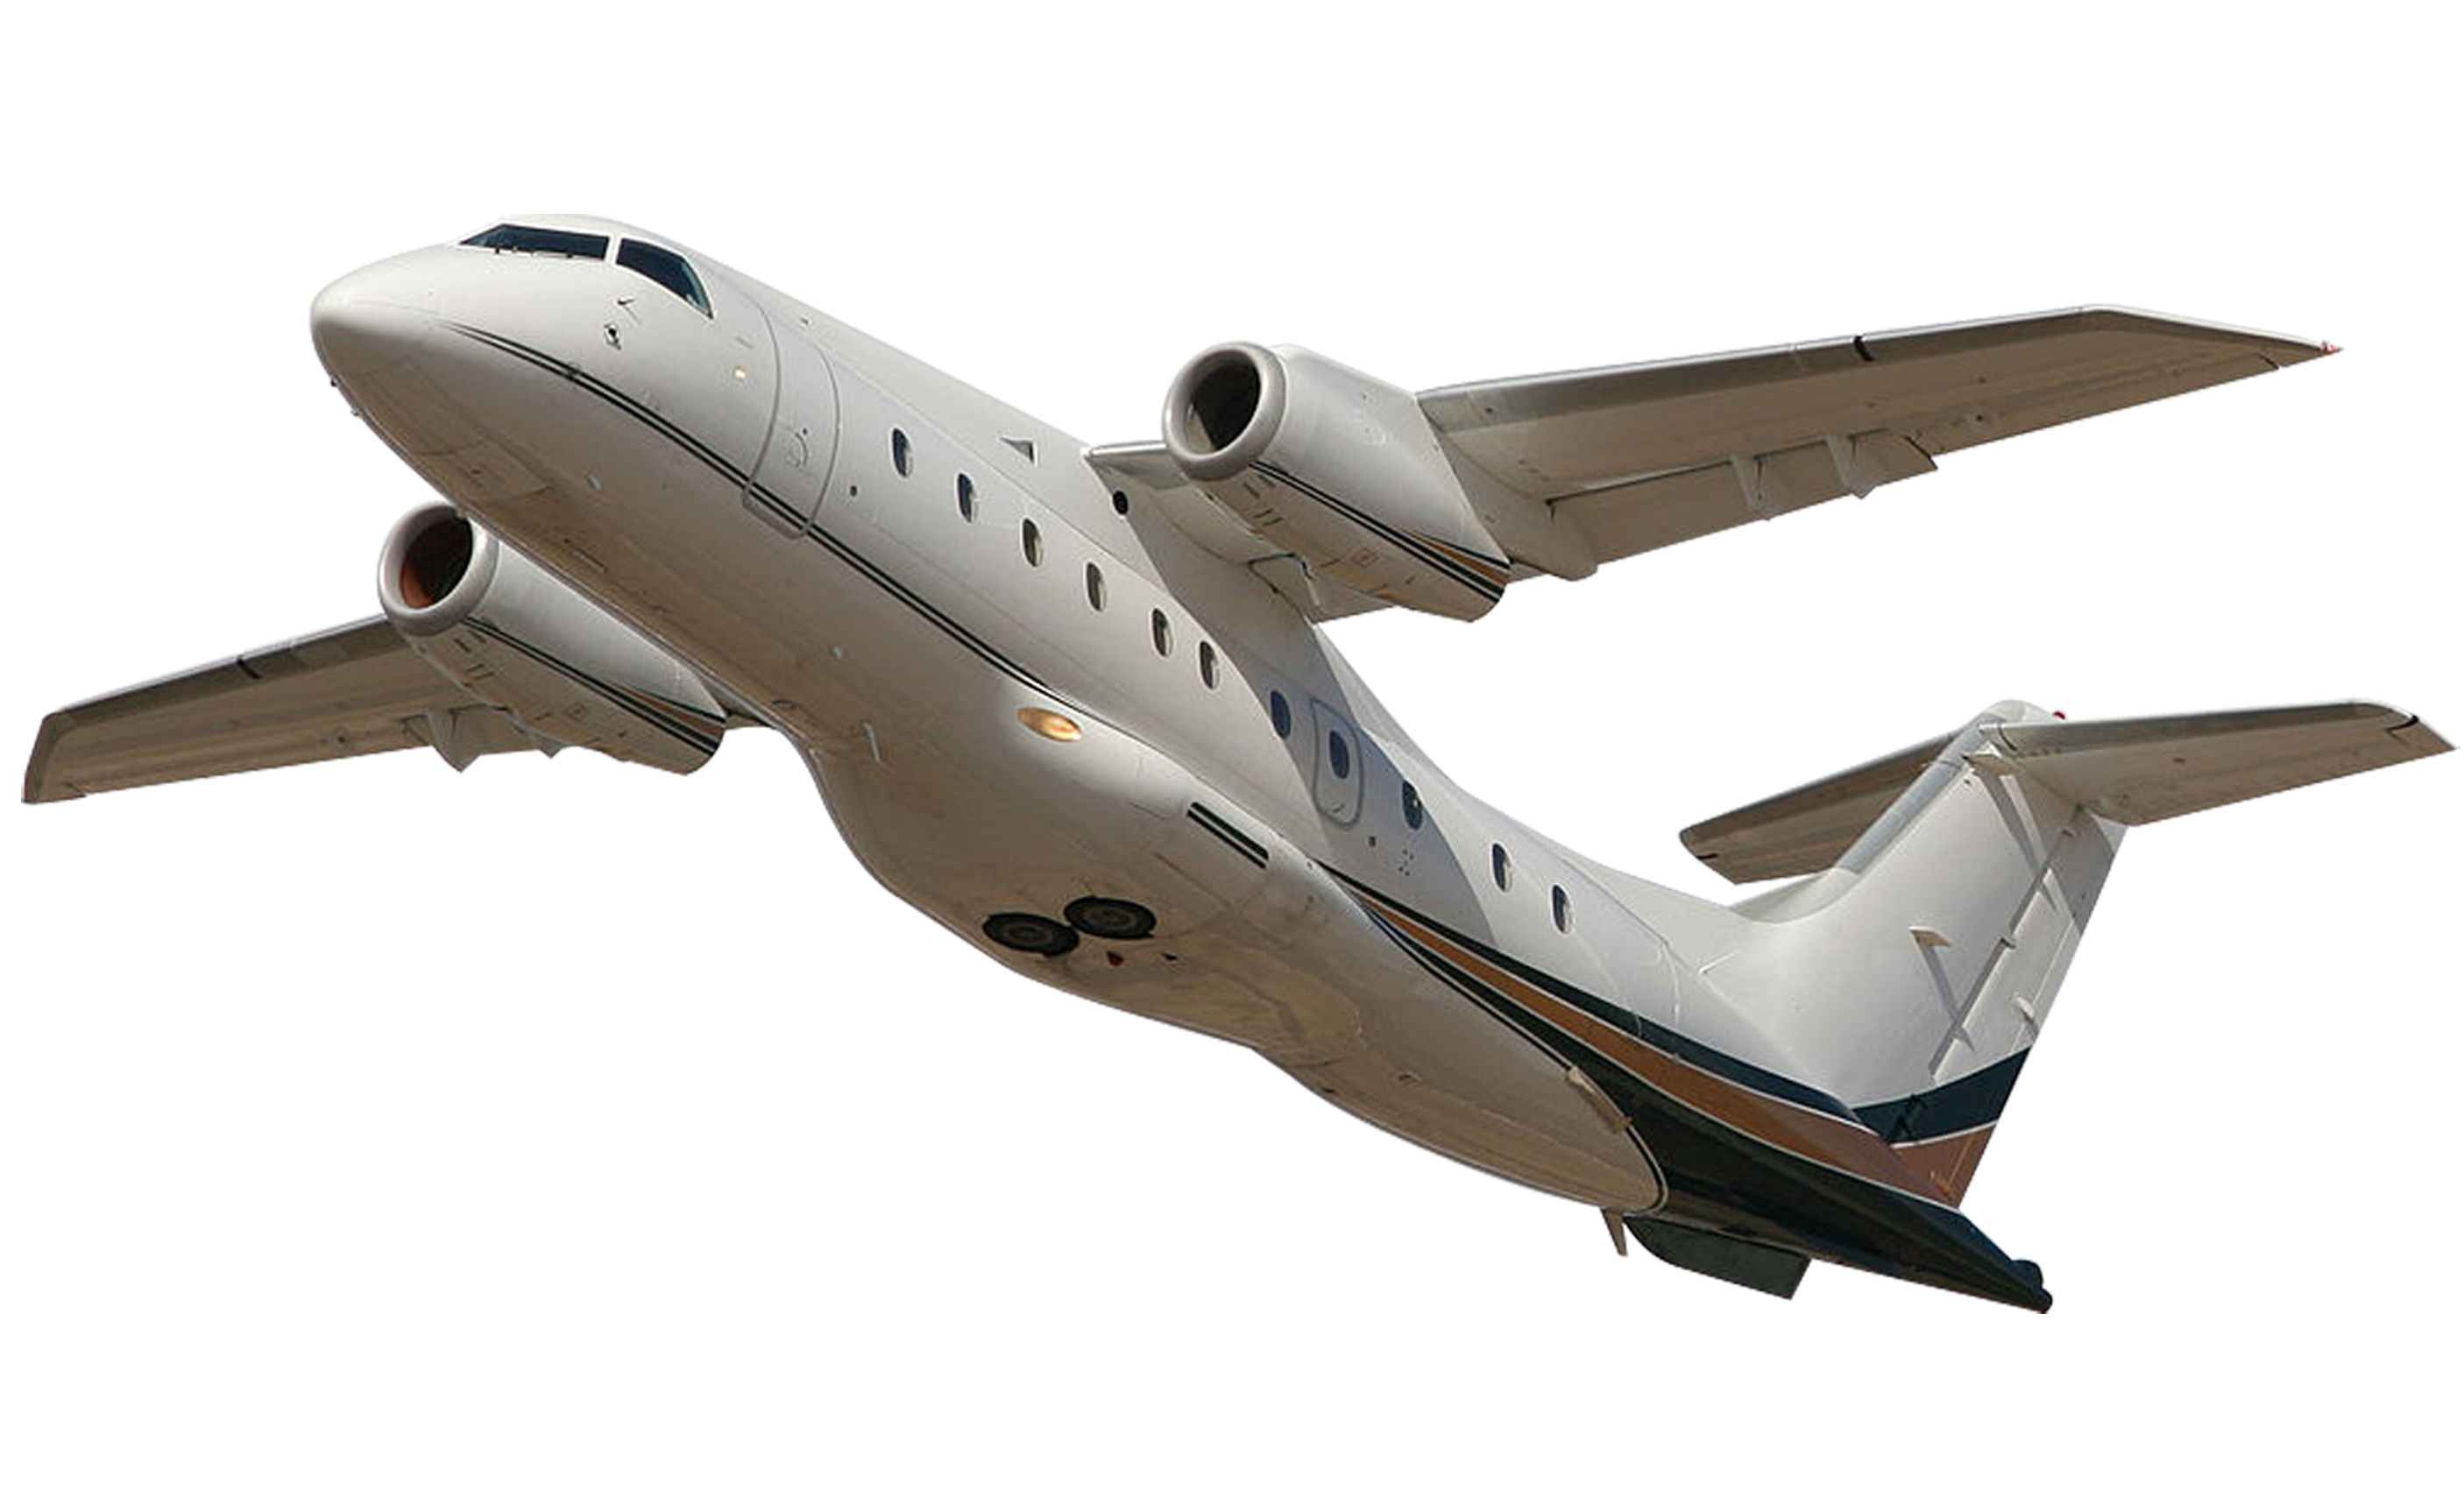 White Plane PNG Image